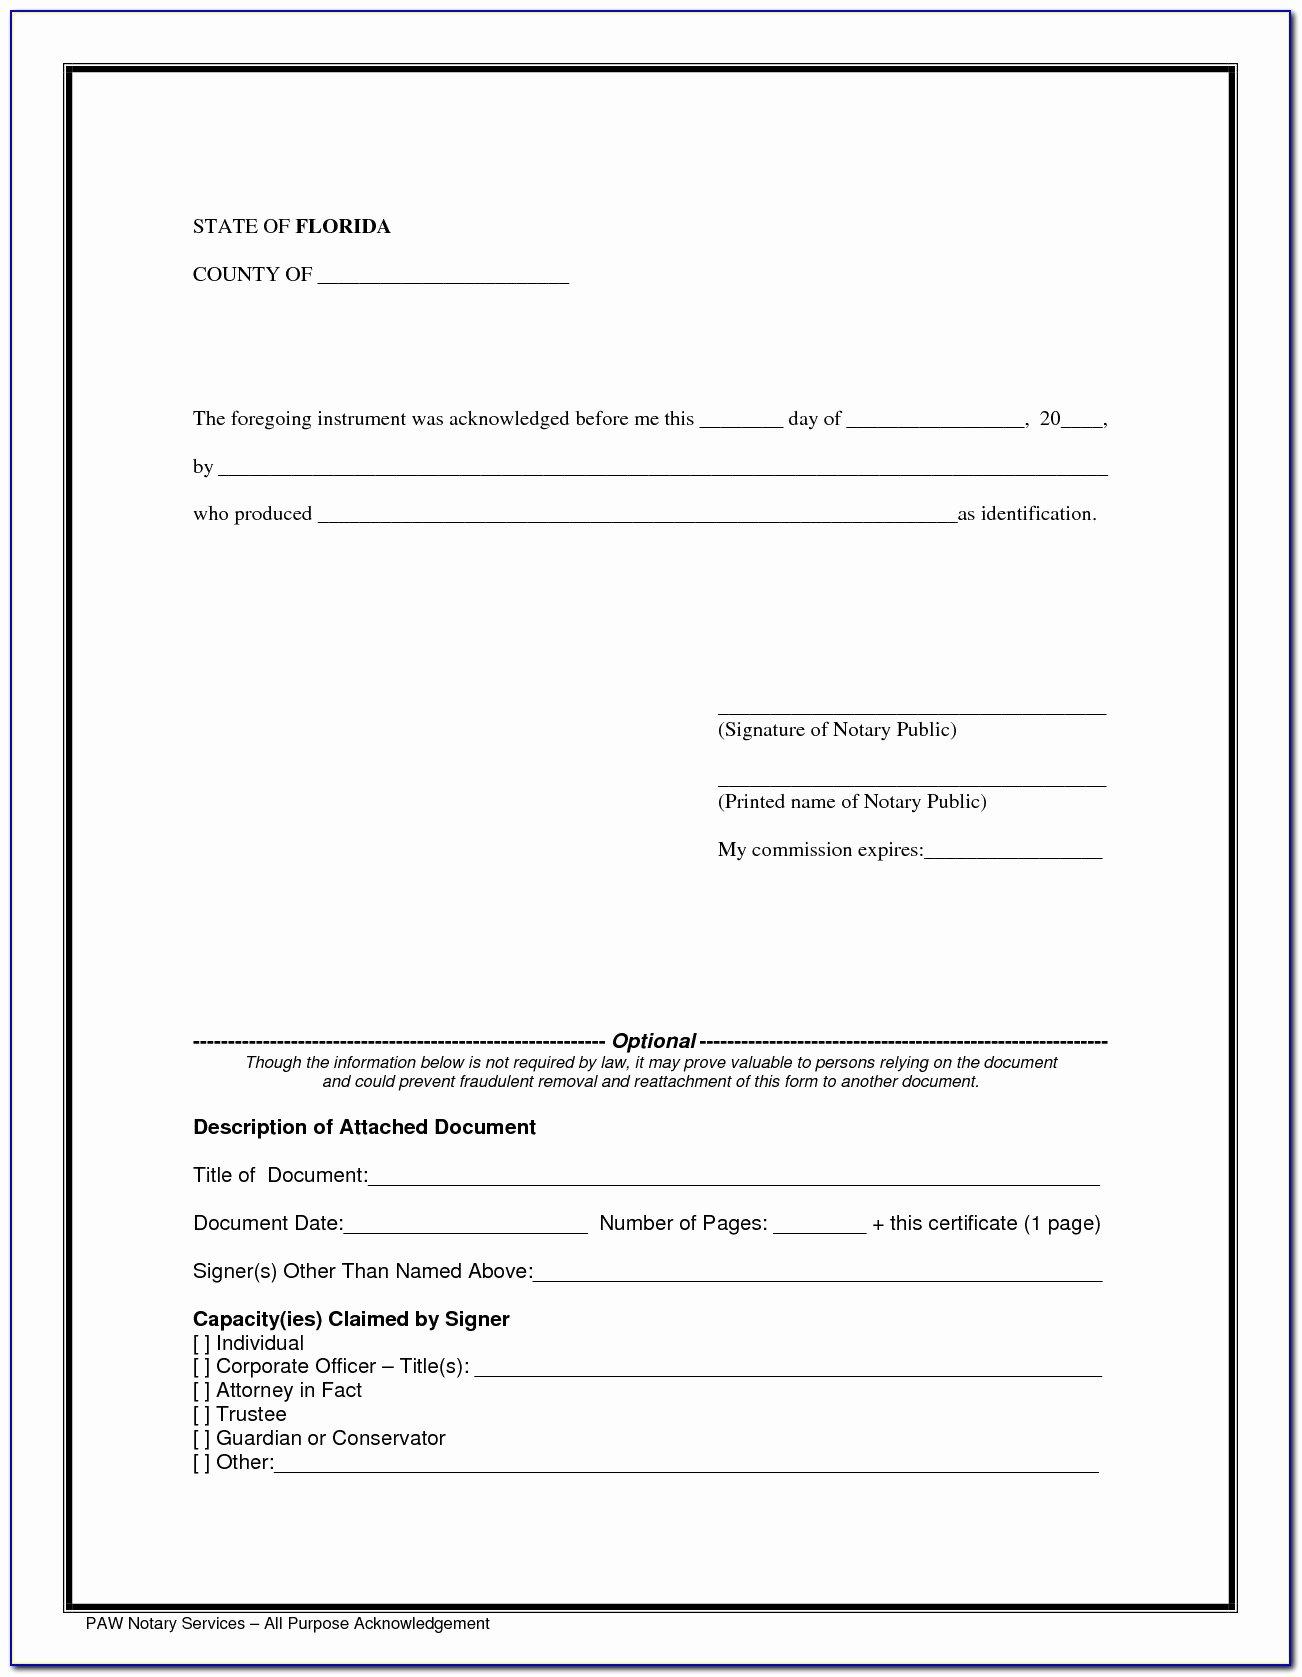 Notary Signature Block Template Elegant Notary Public Signature Line Template Free Templates Block